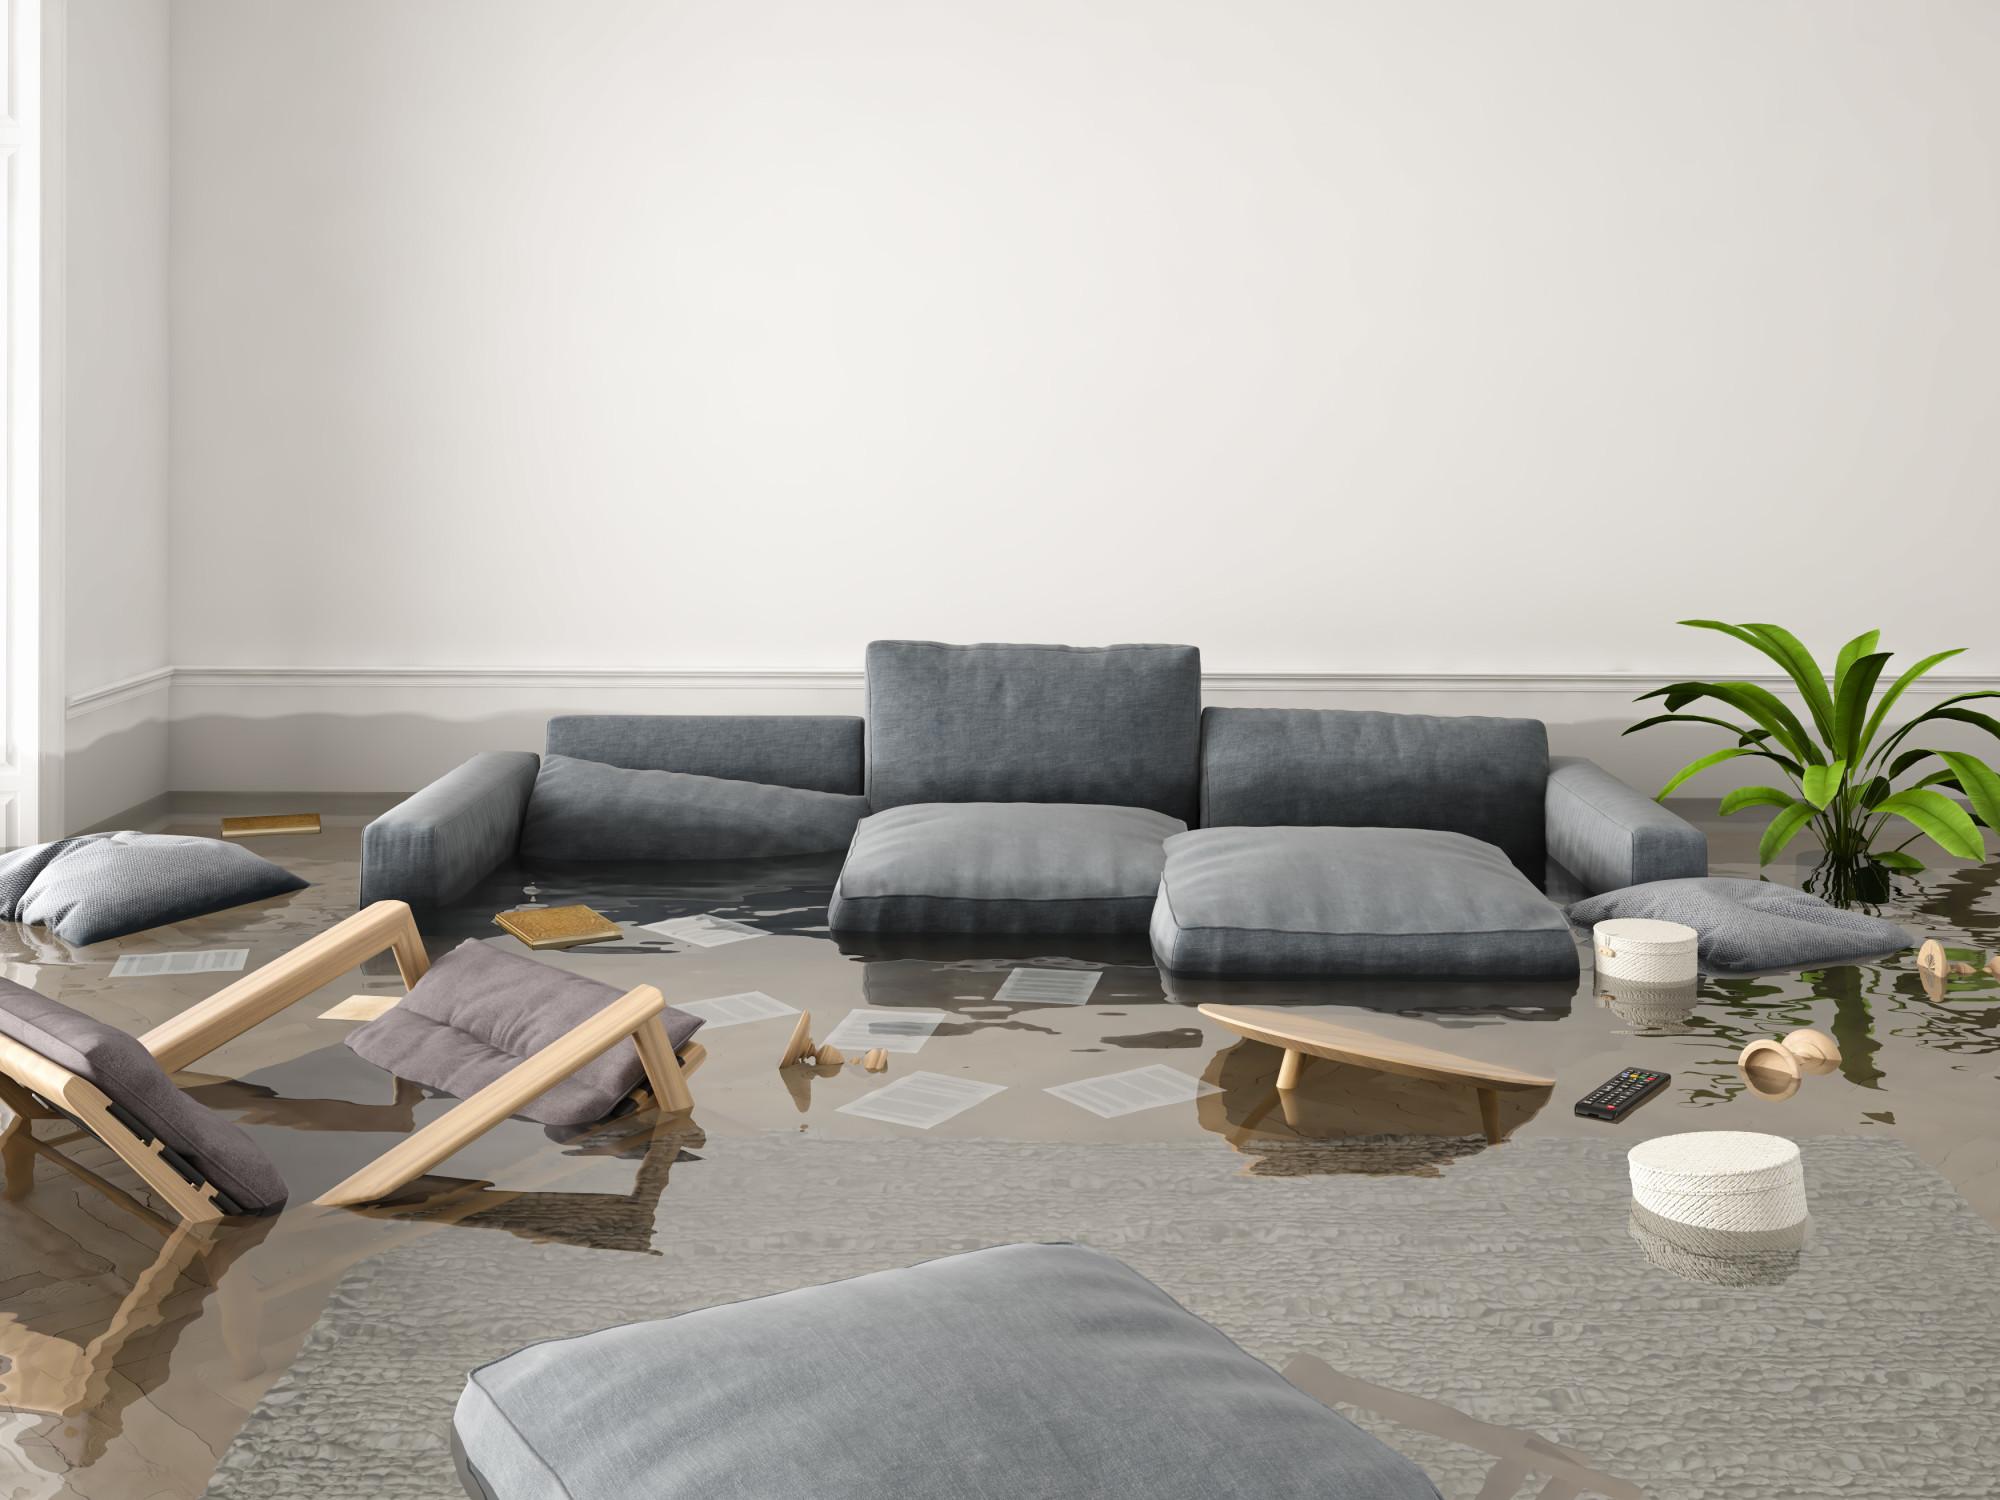 flood proof house